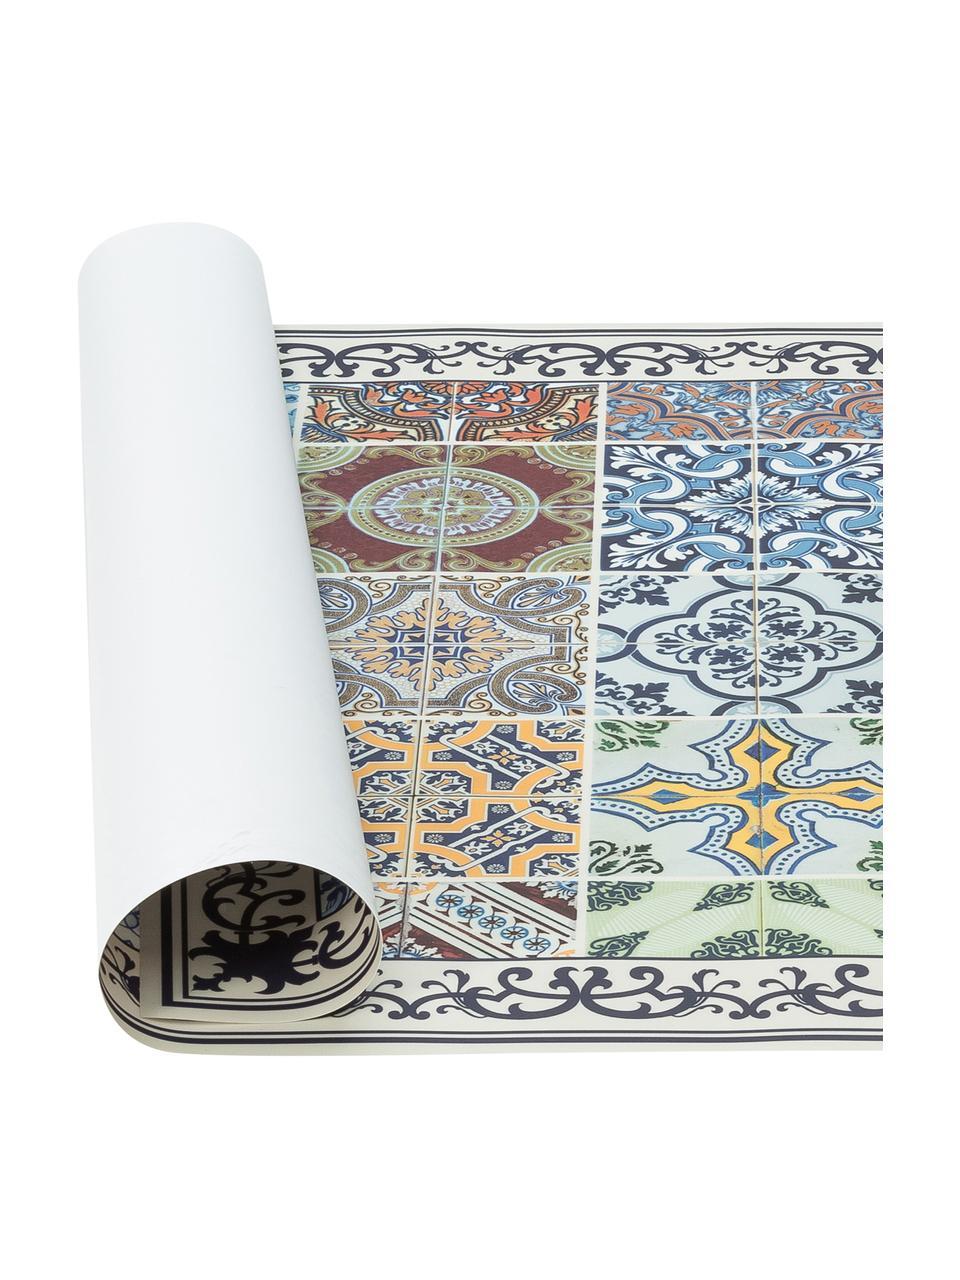 Vlakke vinyl vloermat Pablo met kleurrijke print, antislip, Gerecycled vinyl, Multicolour, 136 x 203 cm